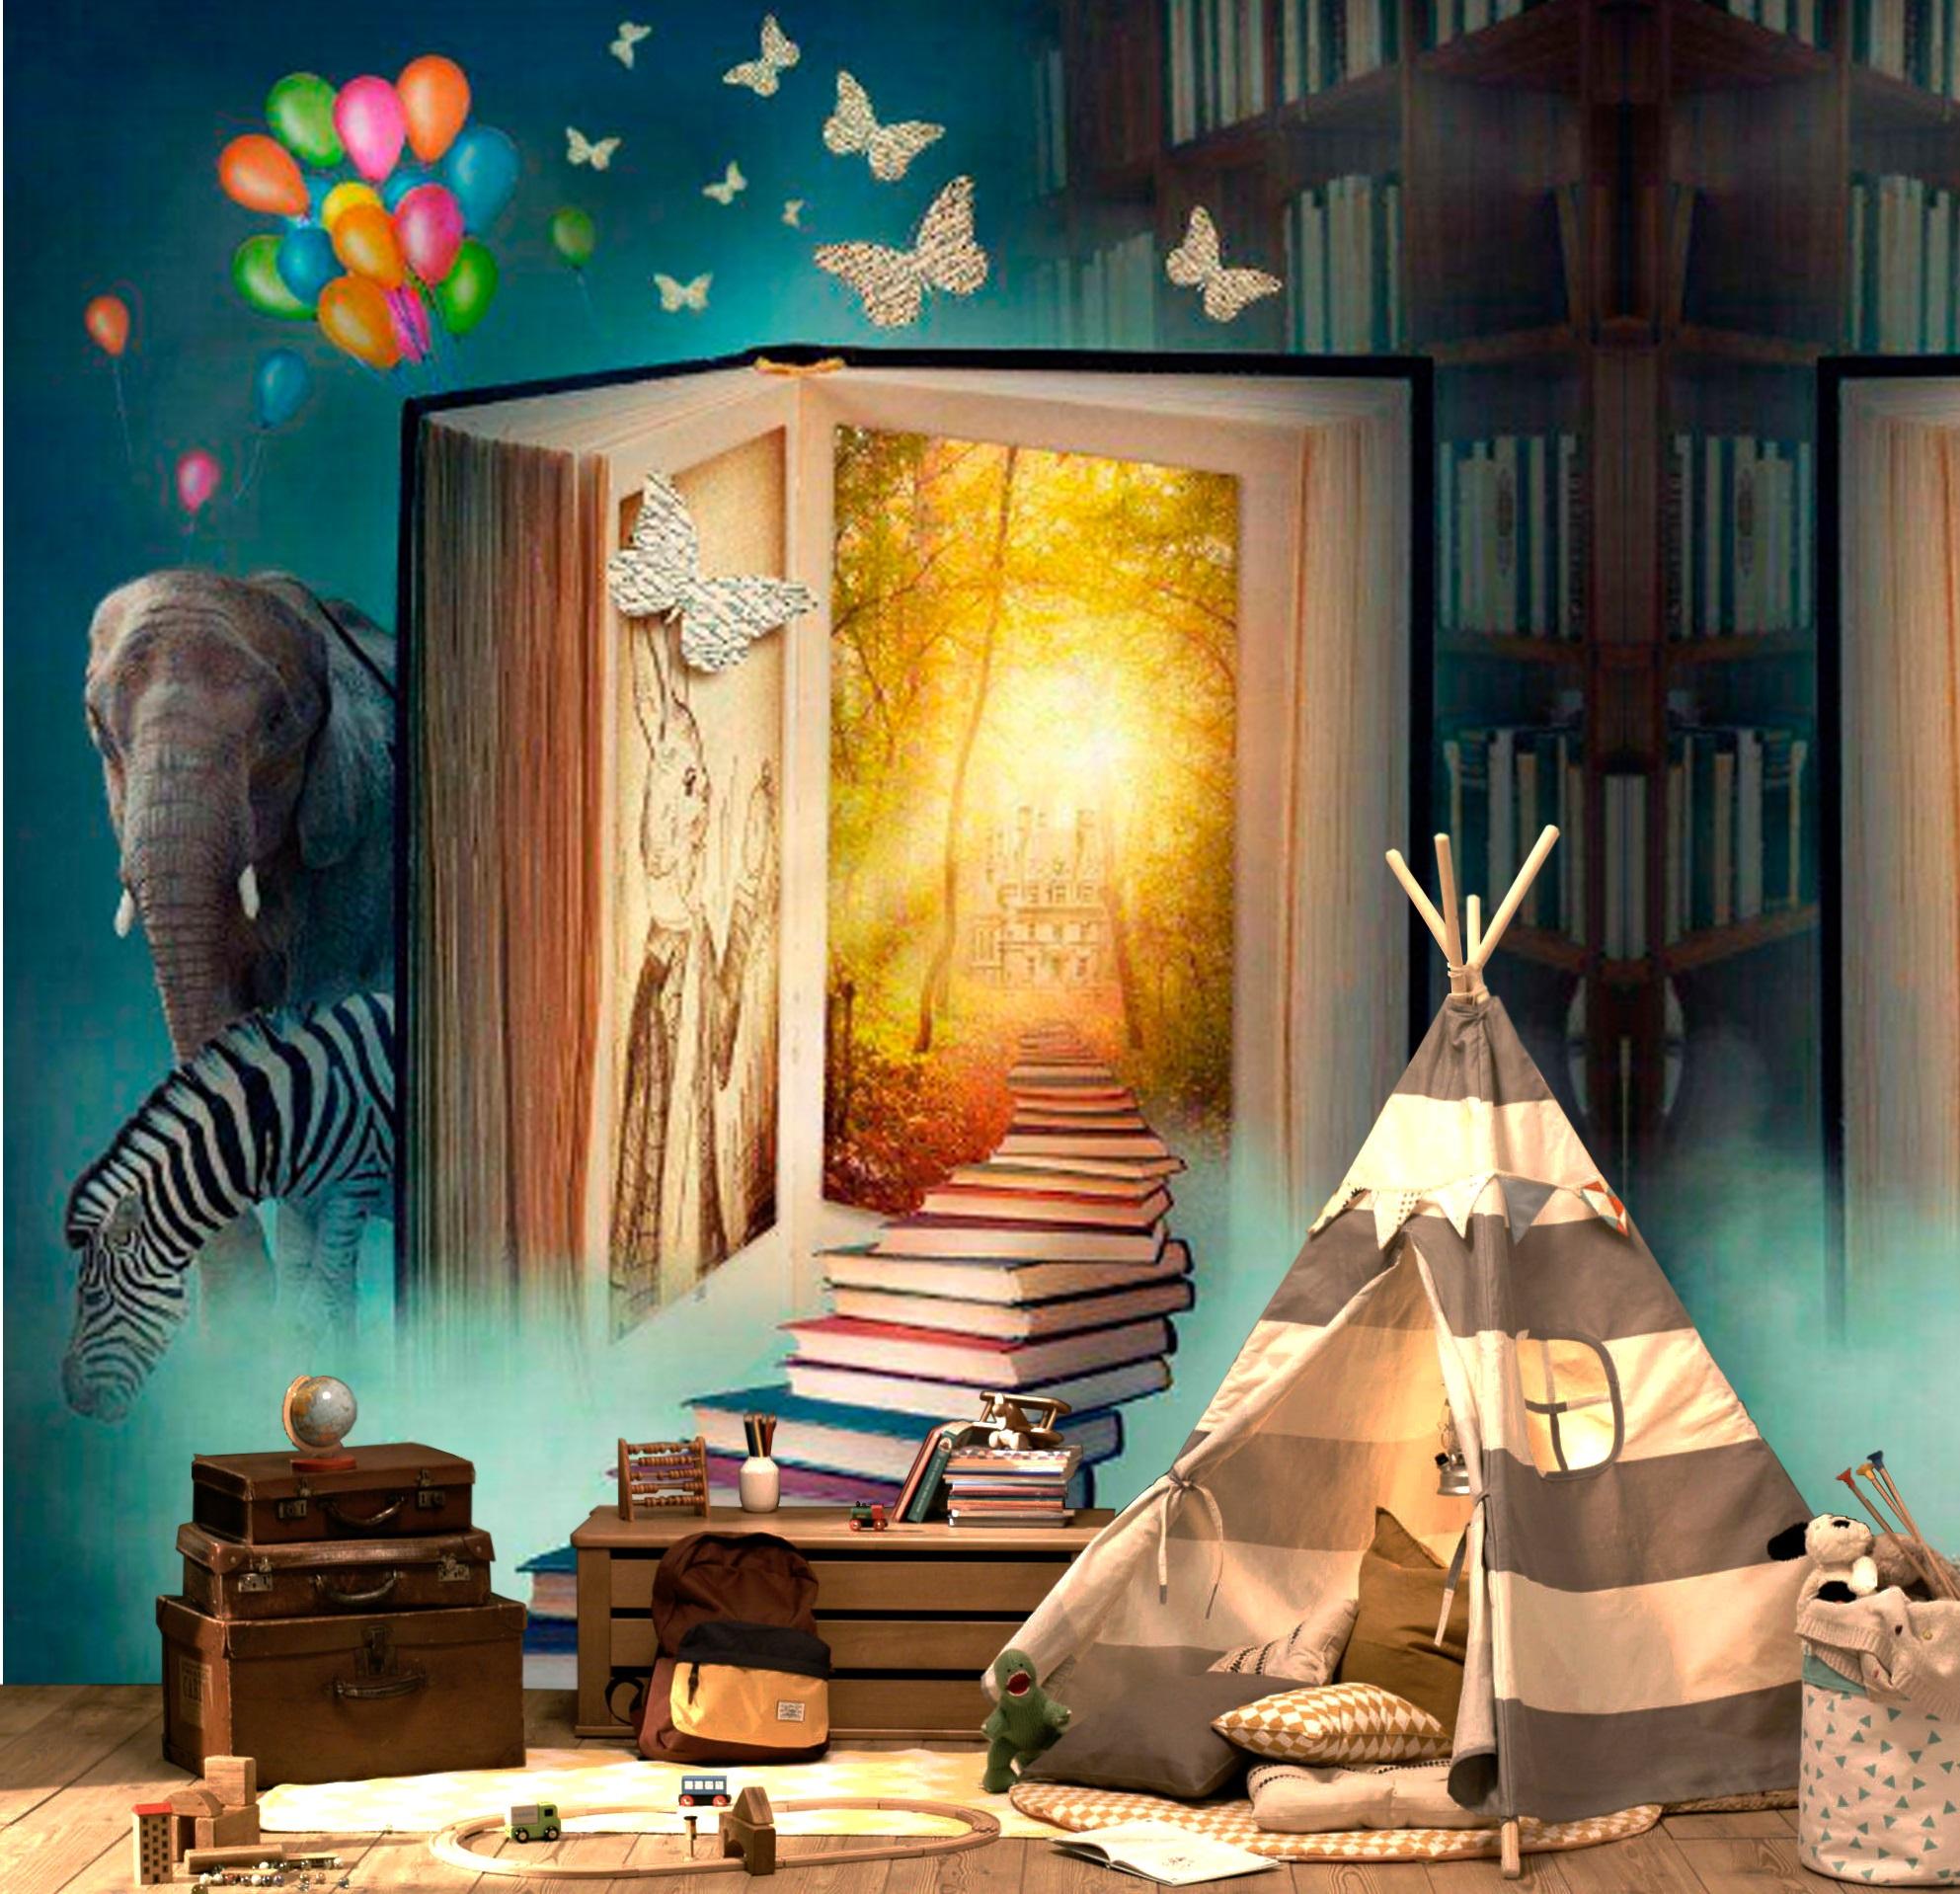 Wallpaper Magical Book Library Elephant Zebra Nursery Self Adhesive